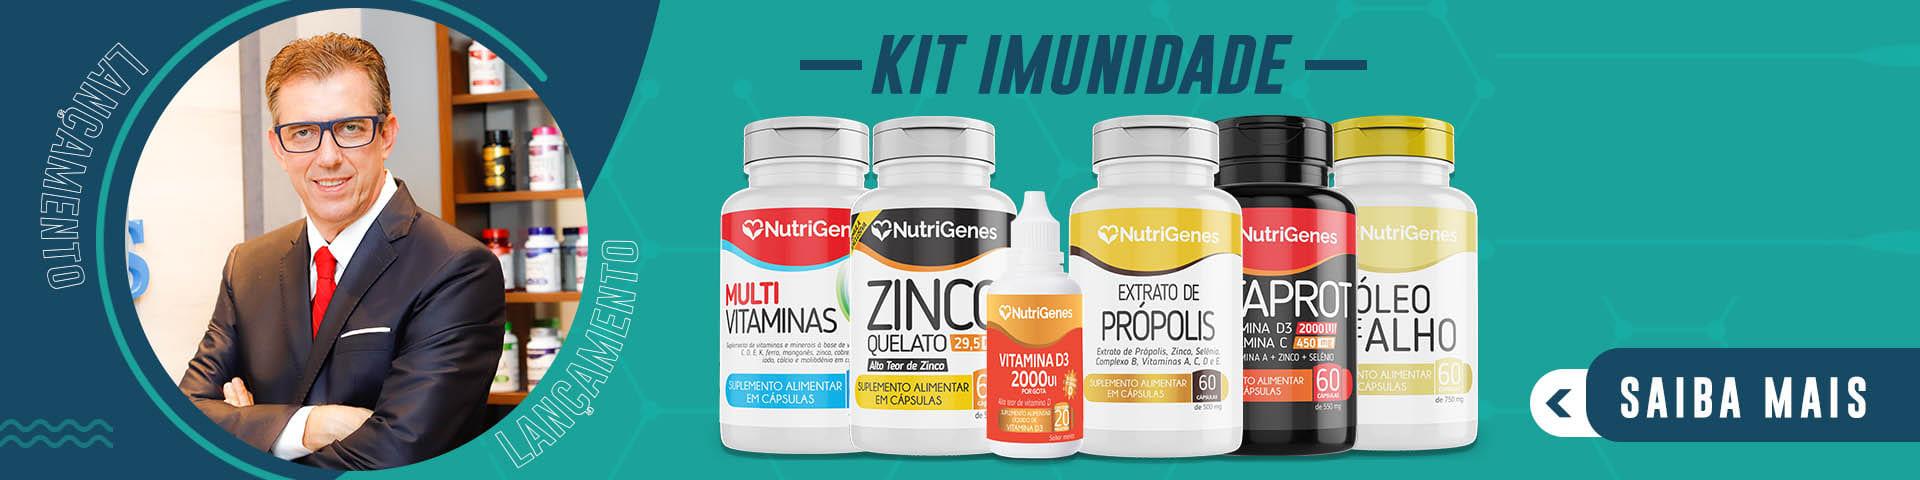 Kit Imunidade 2.0